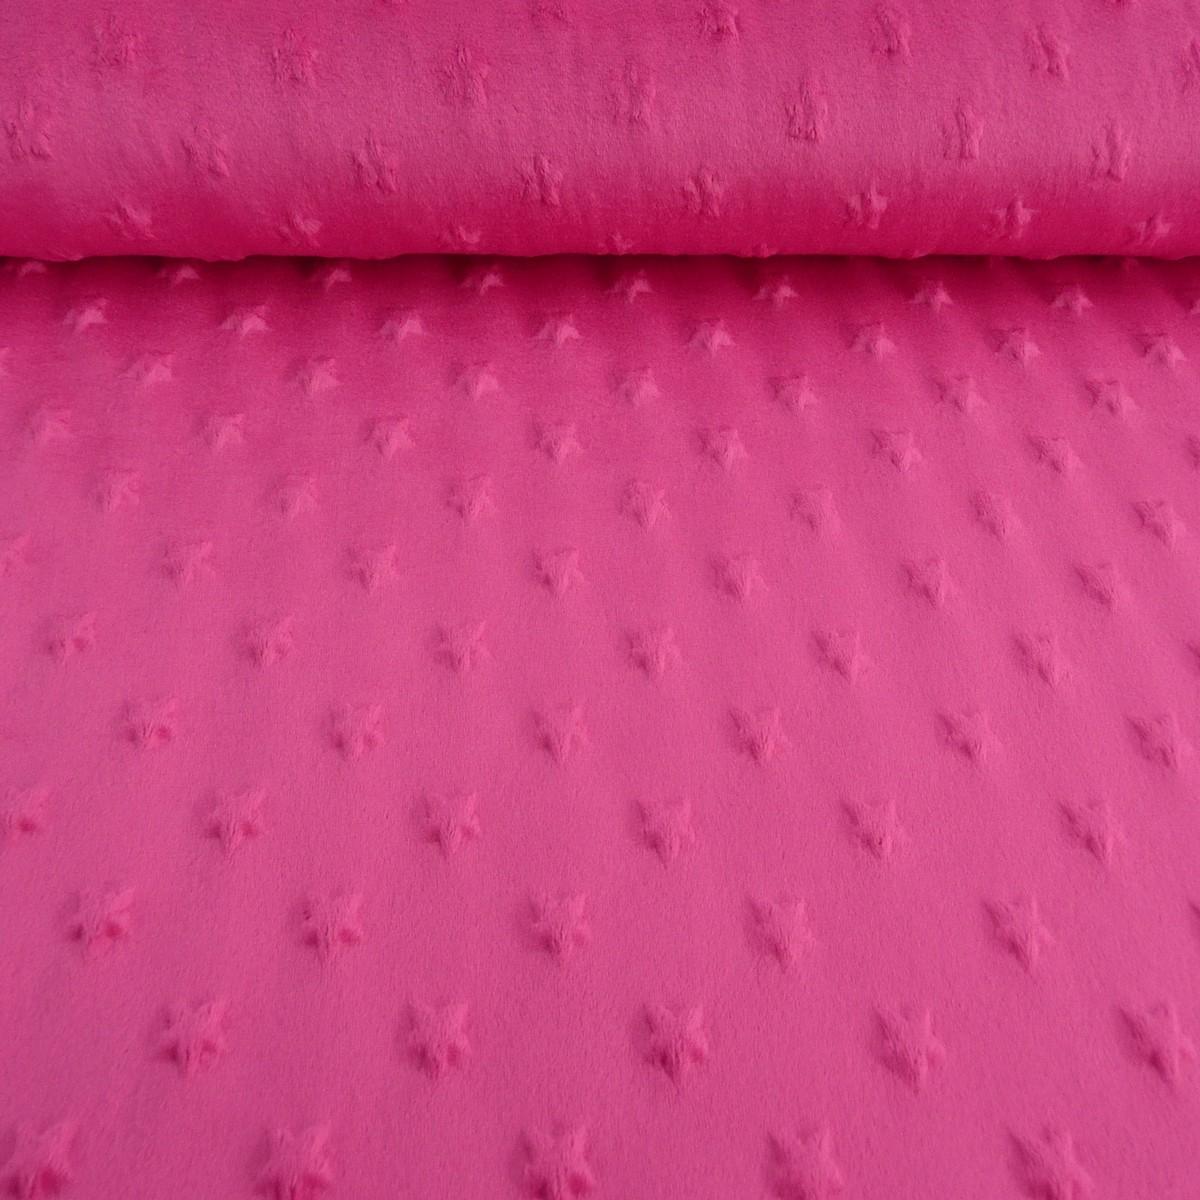 fleece minky stars sterne noppen pink flausch stoff fell pl sch stoffe stoffe uni fleece. Black Bedroom Furniture Sets. Home Design Ideas